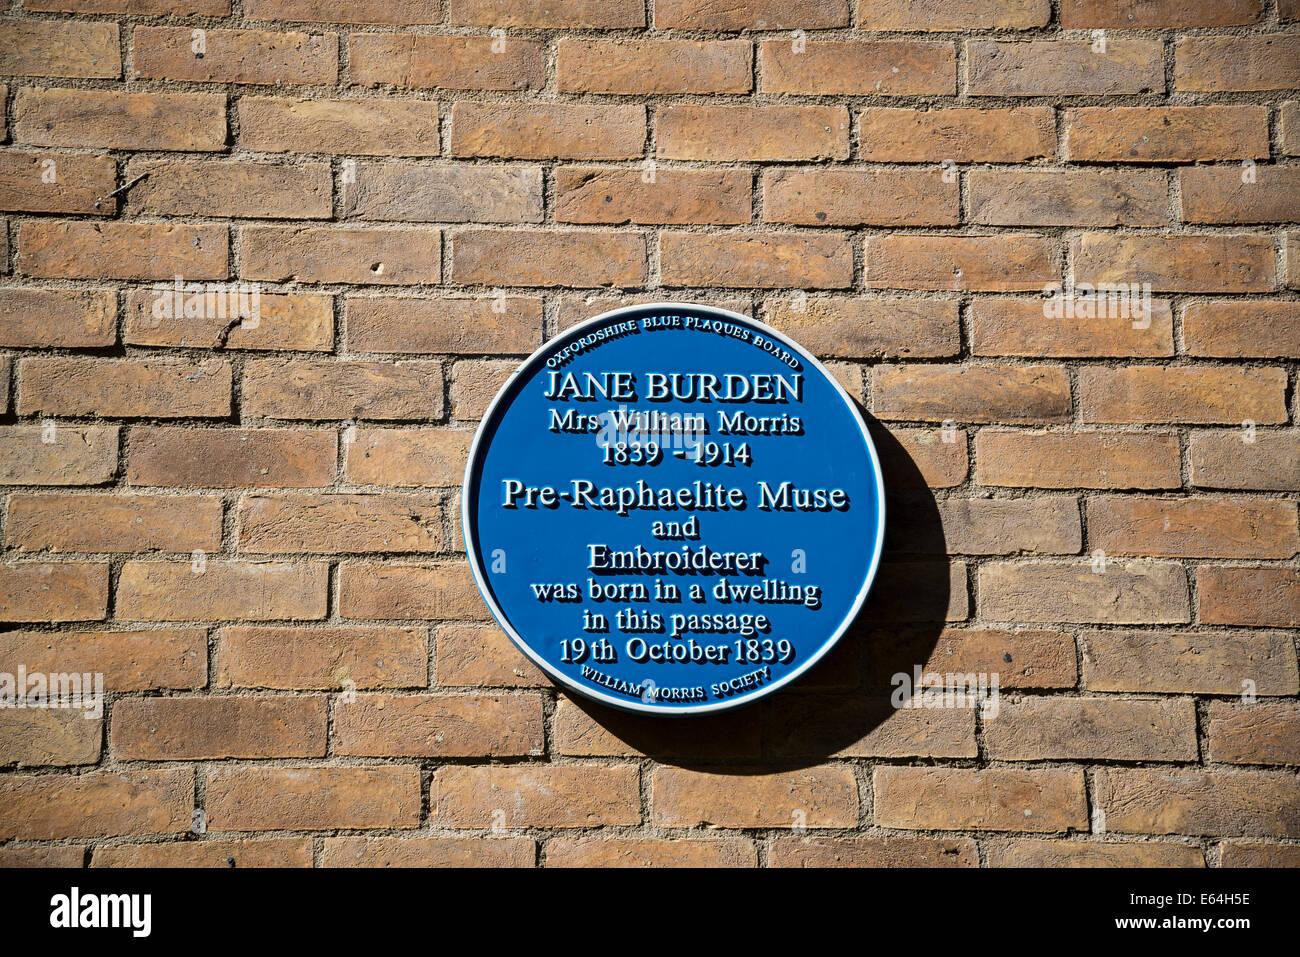 Blaue Gedenktafel für Jane Burden aka Frau William Morris, Oxford, England, UK Stockbild